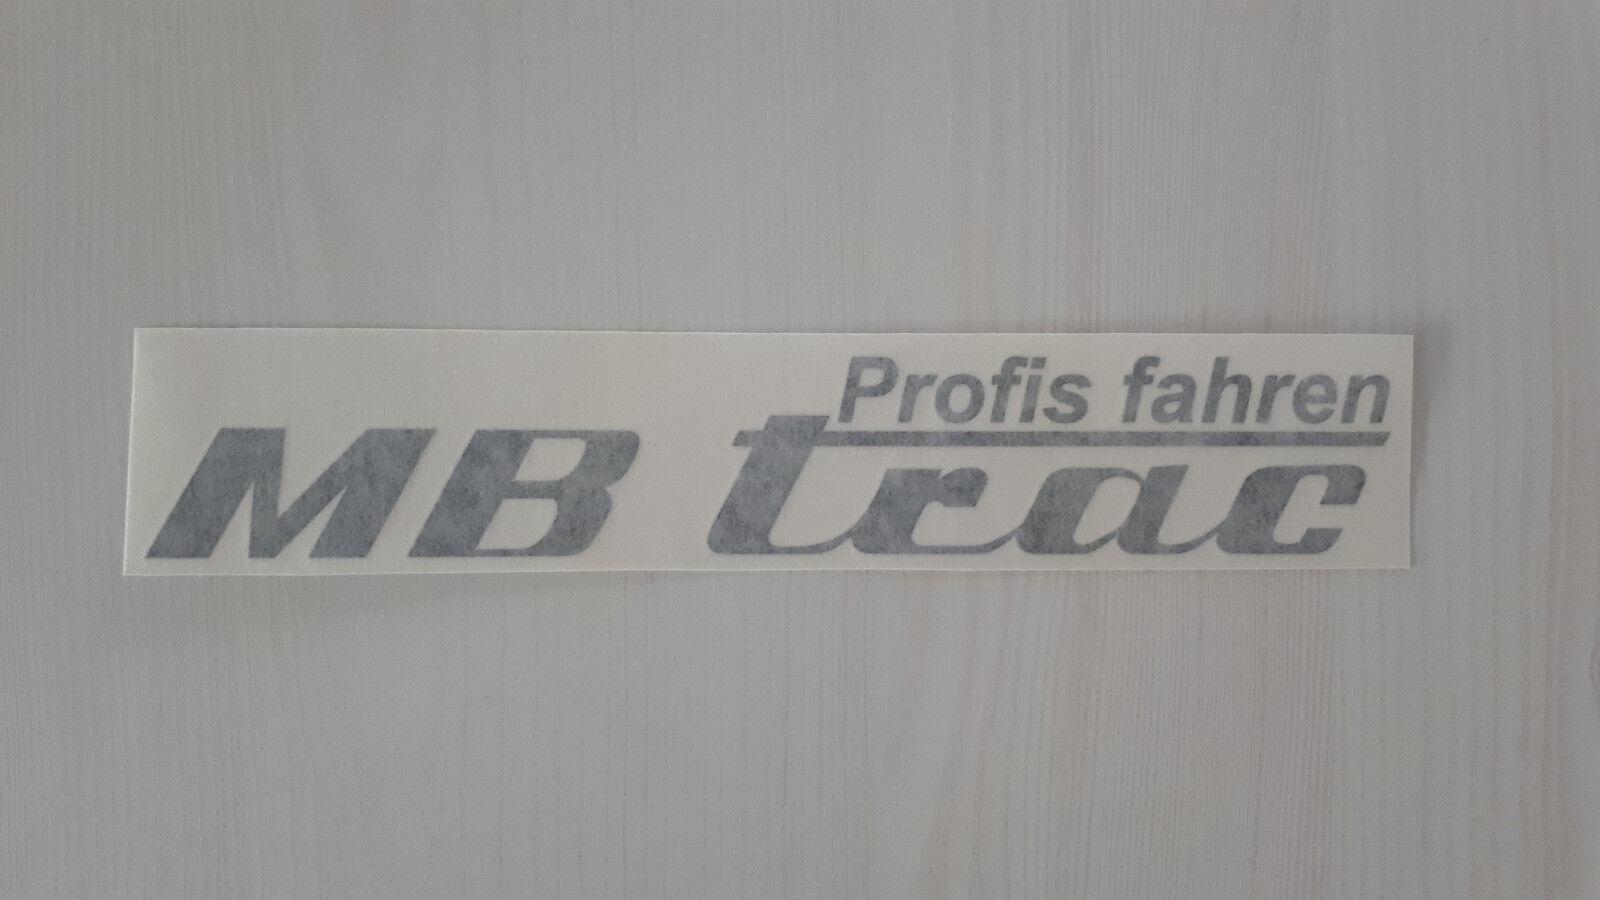 1500 U 425 U 424 1300 Aufkleber Allrad Sperre in schwarz Unimog MB-trac 1100